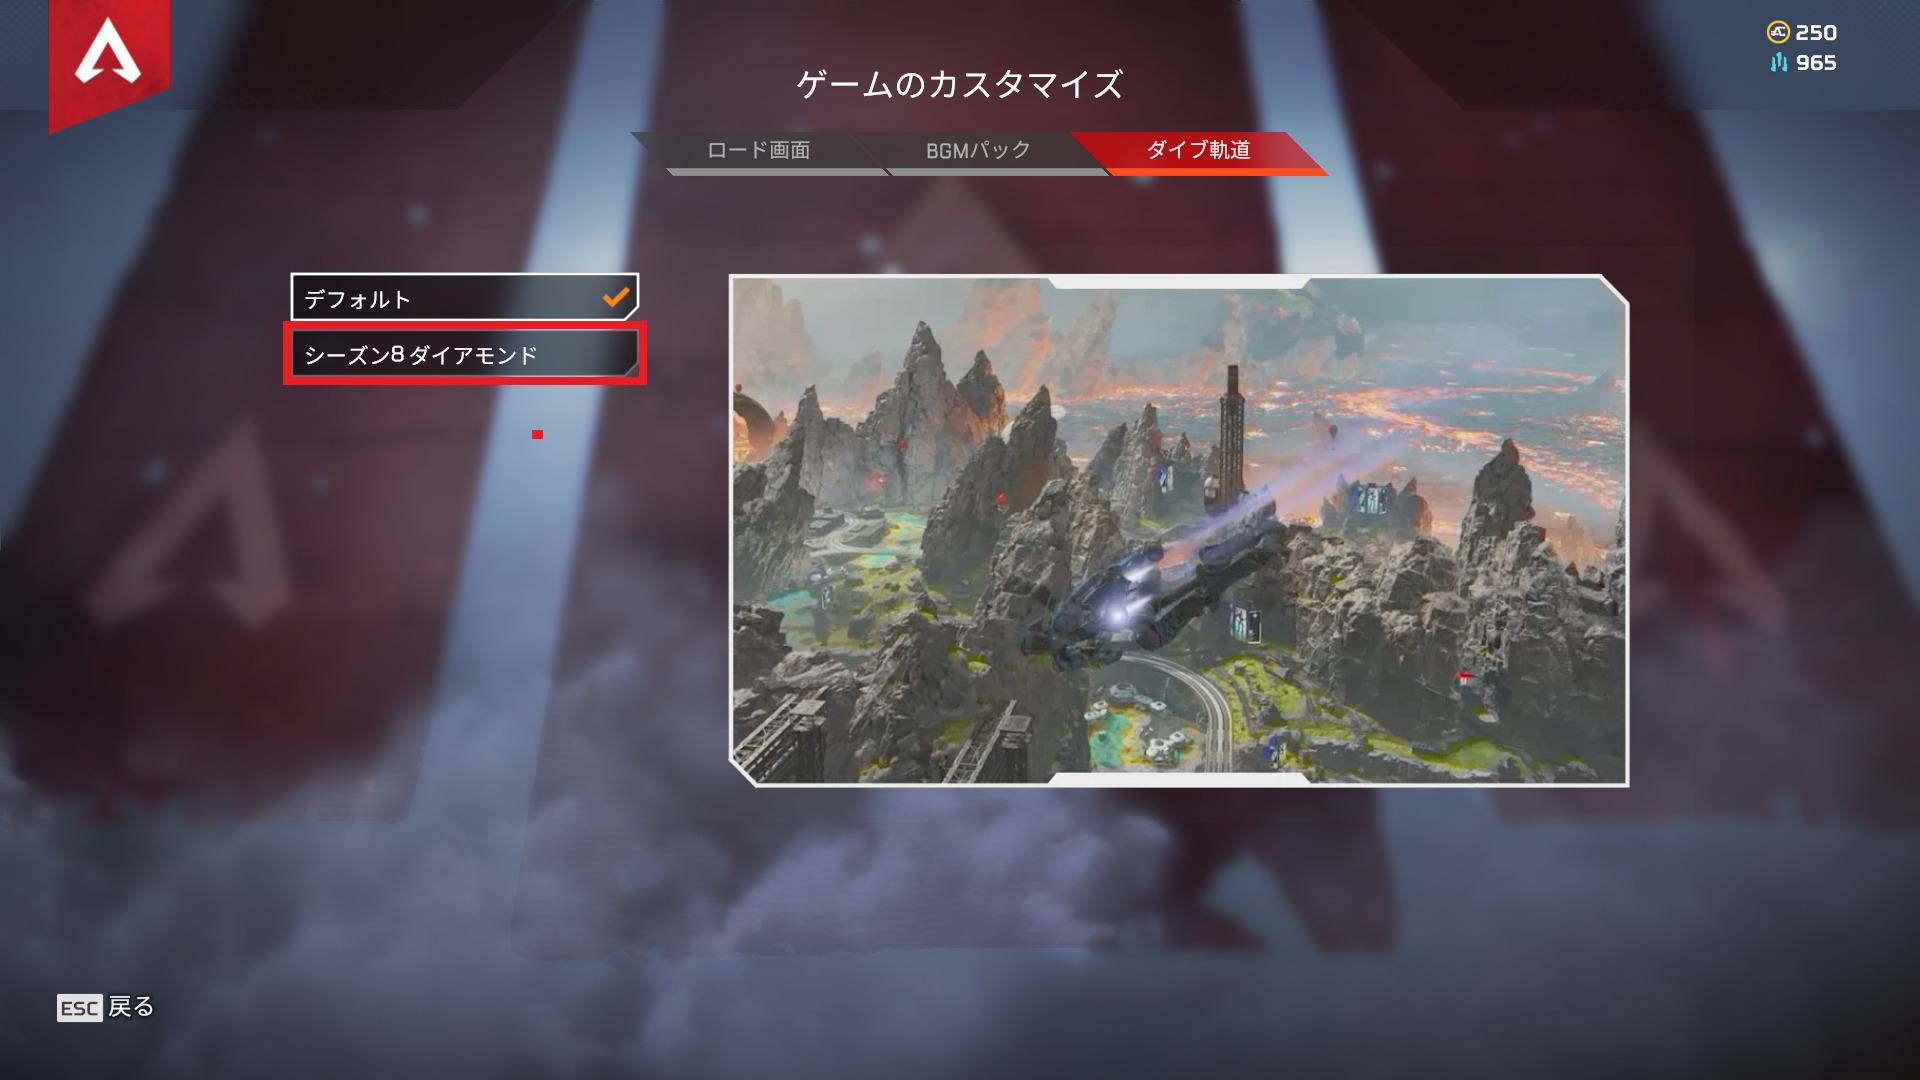 【Apex Legends】ランク報酬(バッチ、軌道)はいつもらえる?ダイブ軌道の変え方【エーペックスレジェンズ】